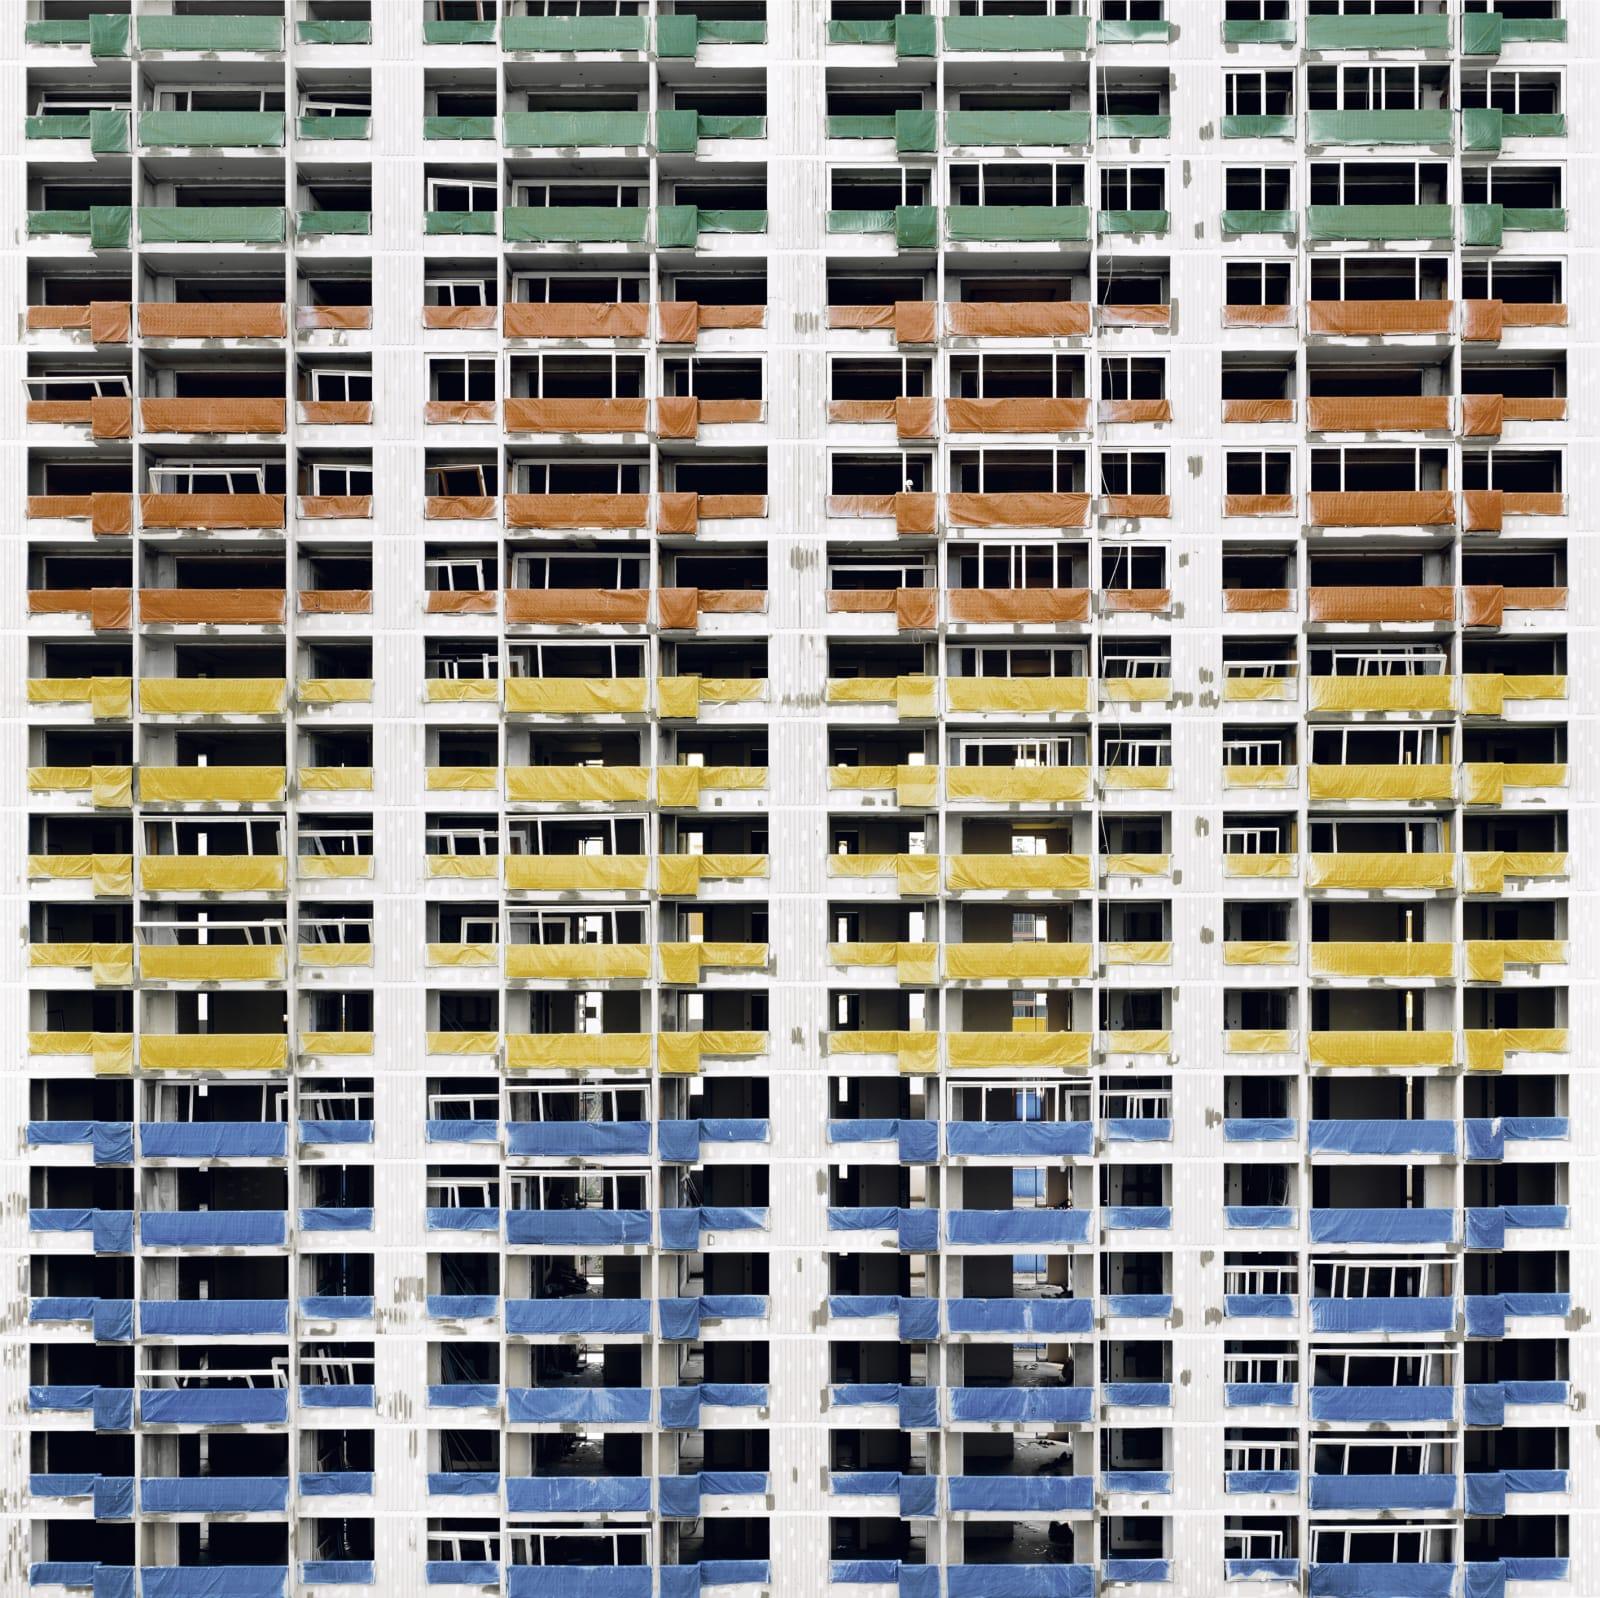 Stéphane Couturier, SEOUL - Tanji# 03 , 2003